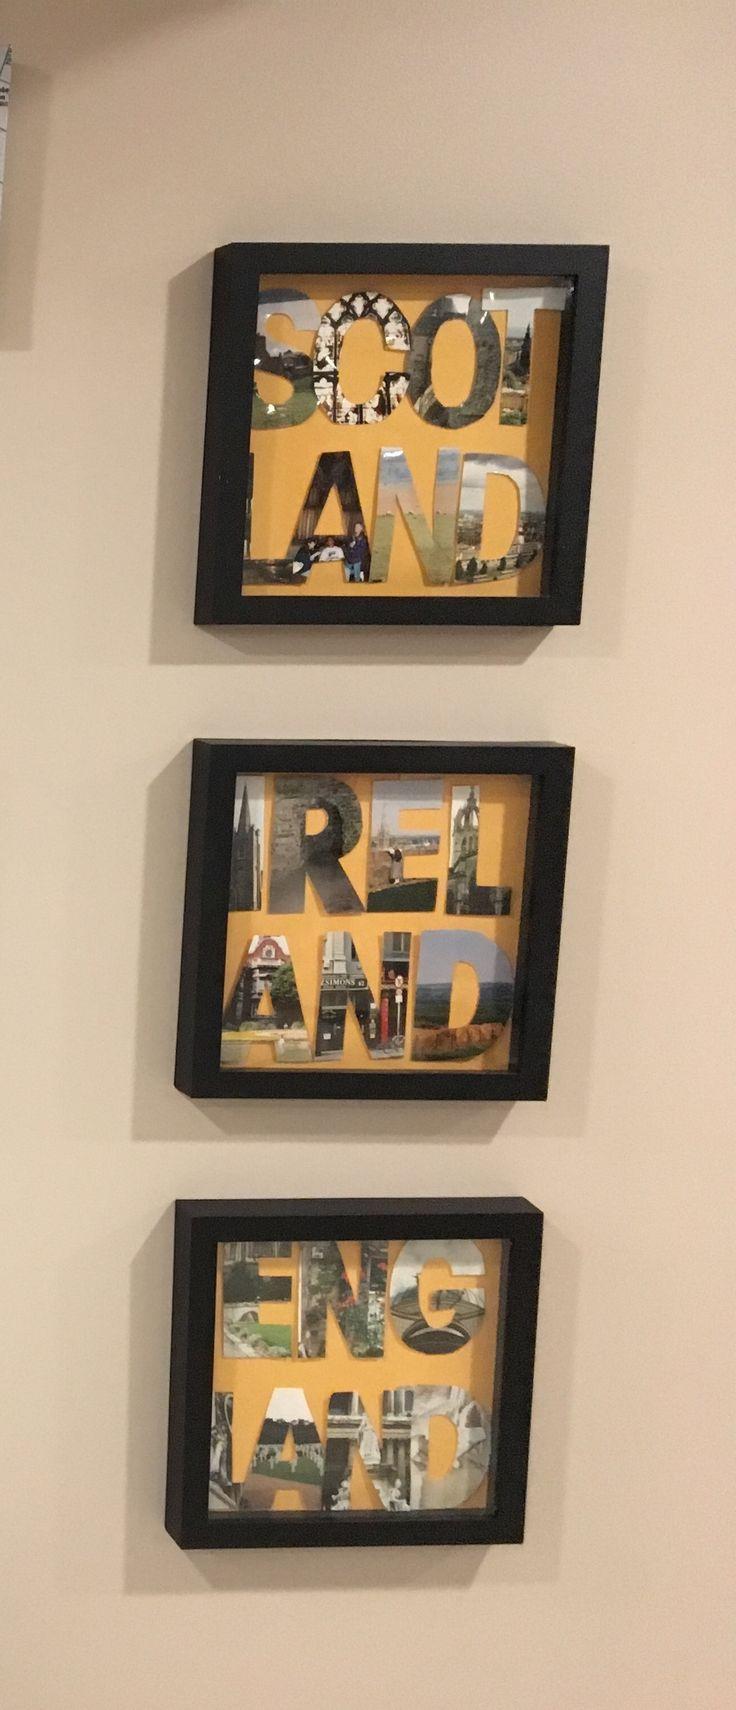 Travel photo display - my pinspiration